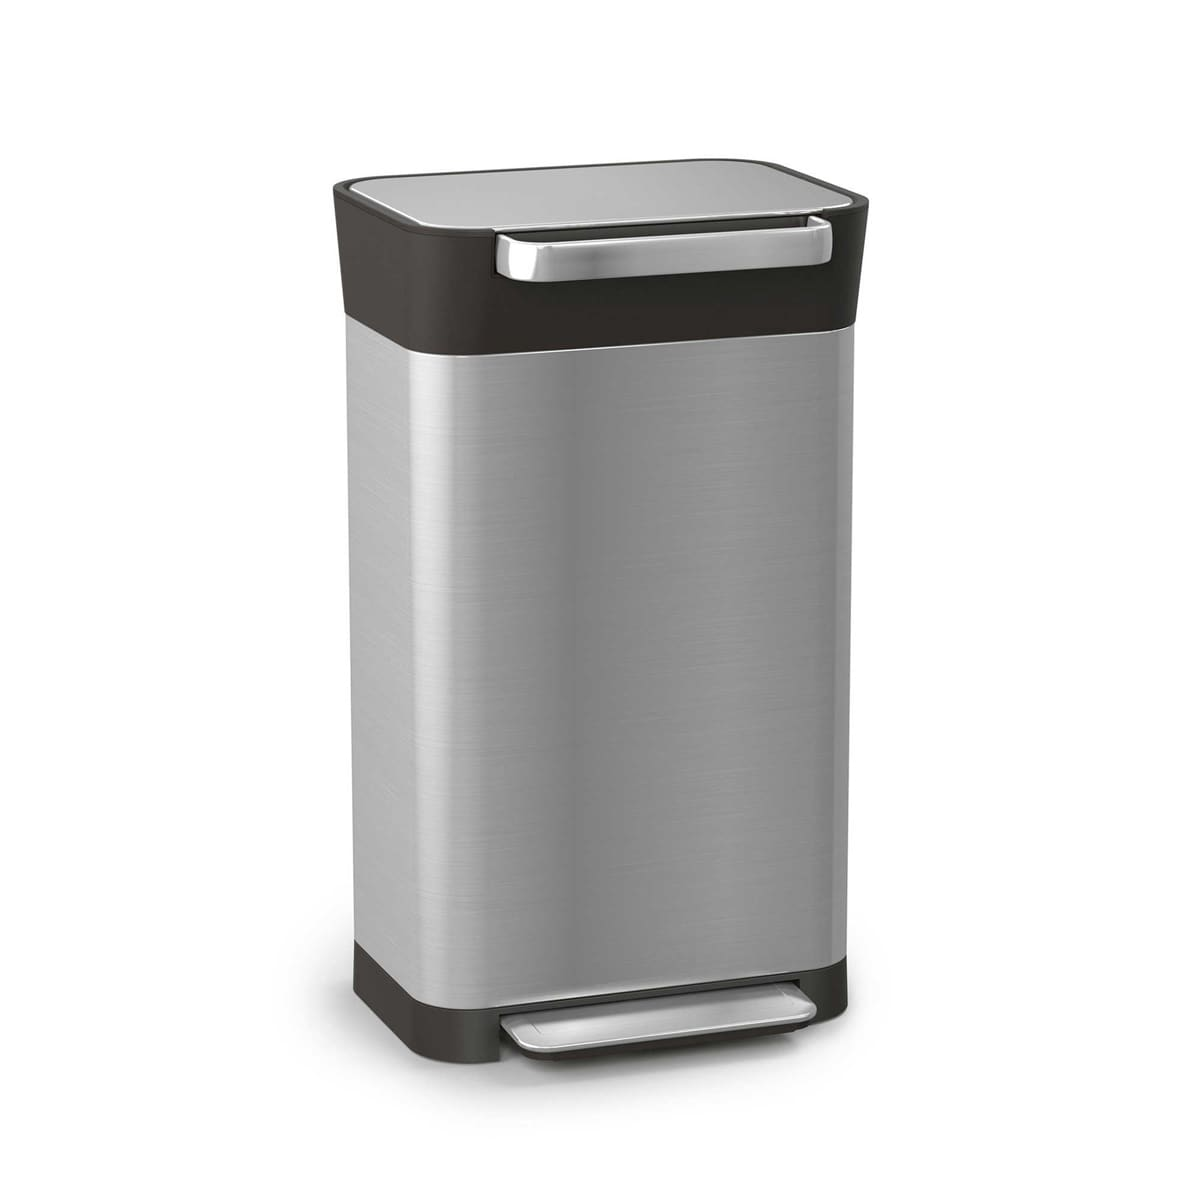 Best Kitchen Trash Cans - $200 or Less | Kitchn